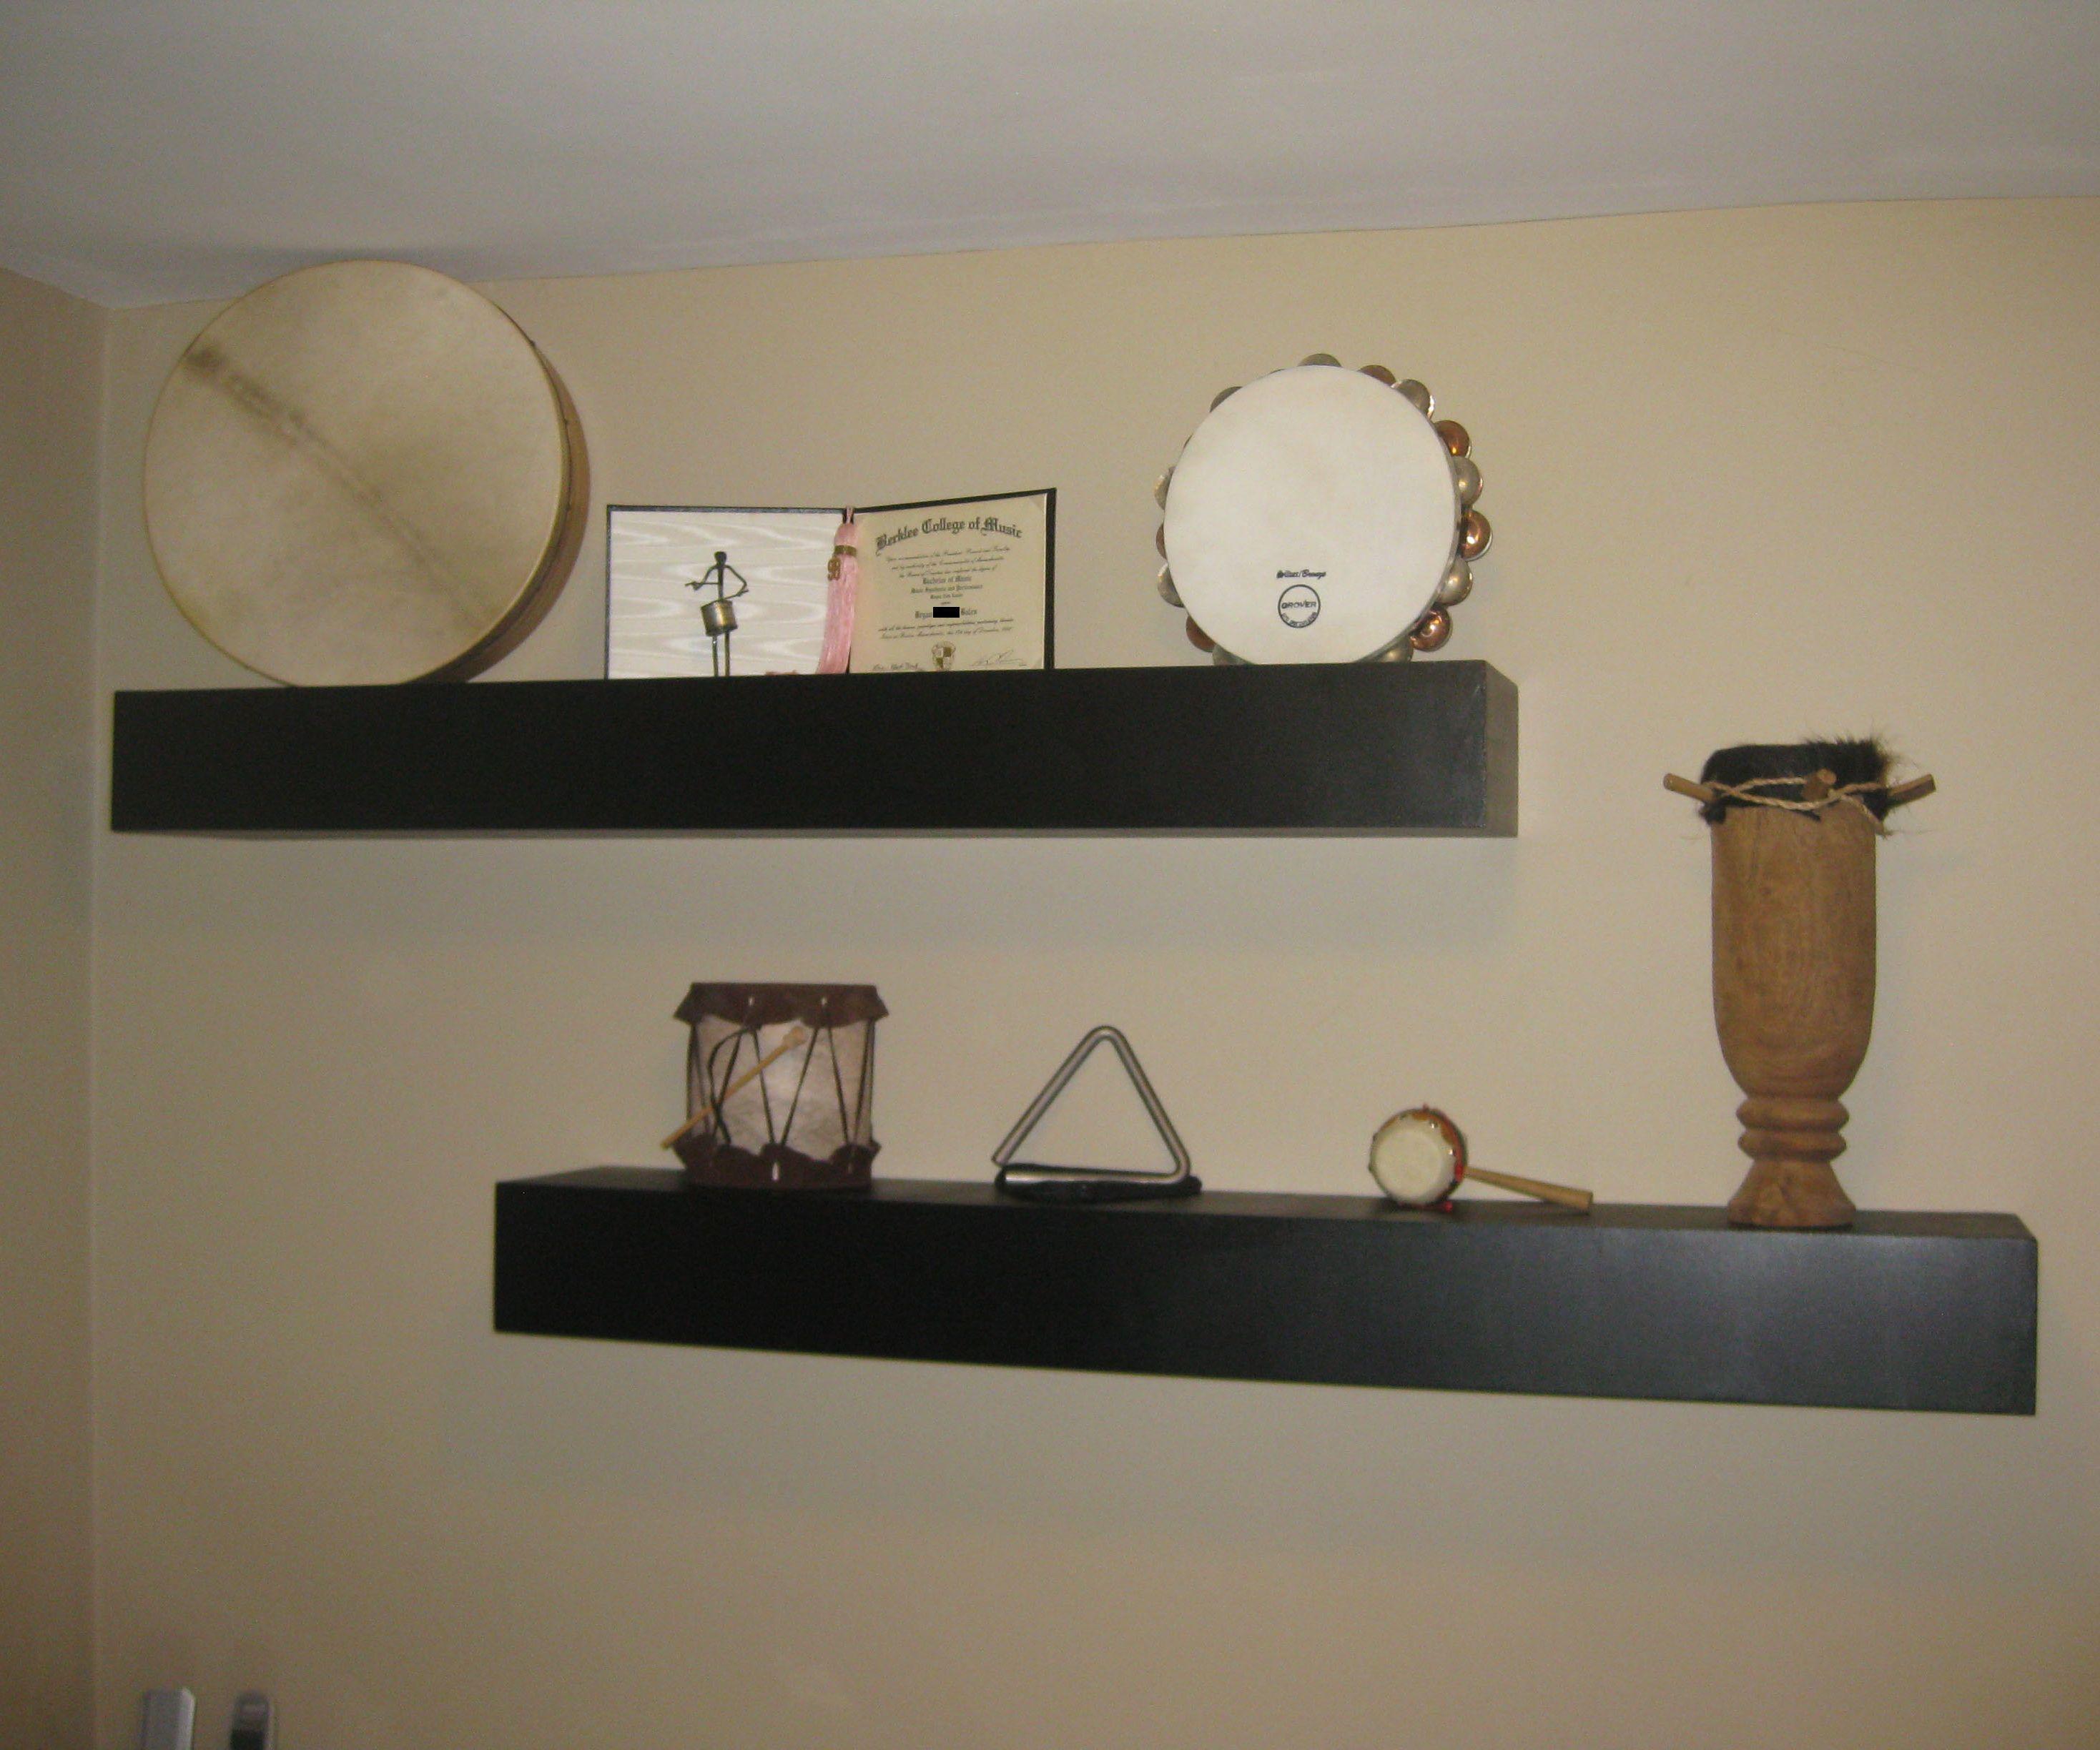 The Floating Shelves